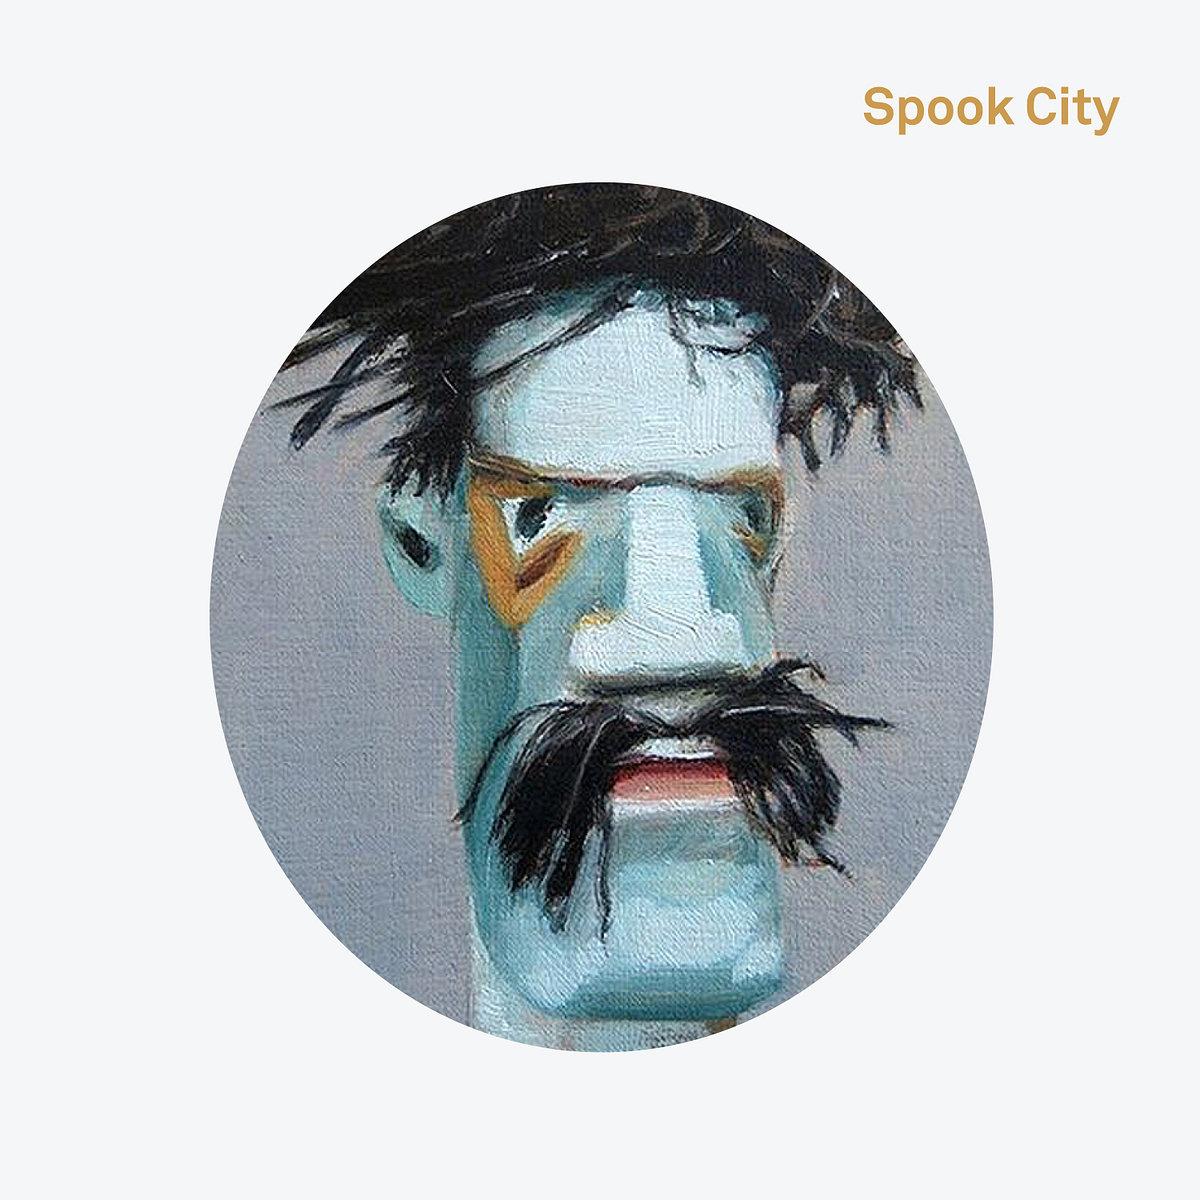 Spook City [Recorded & Mixed (JB), Produced (AP), Mastered (JP), WTR]